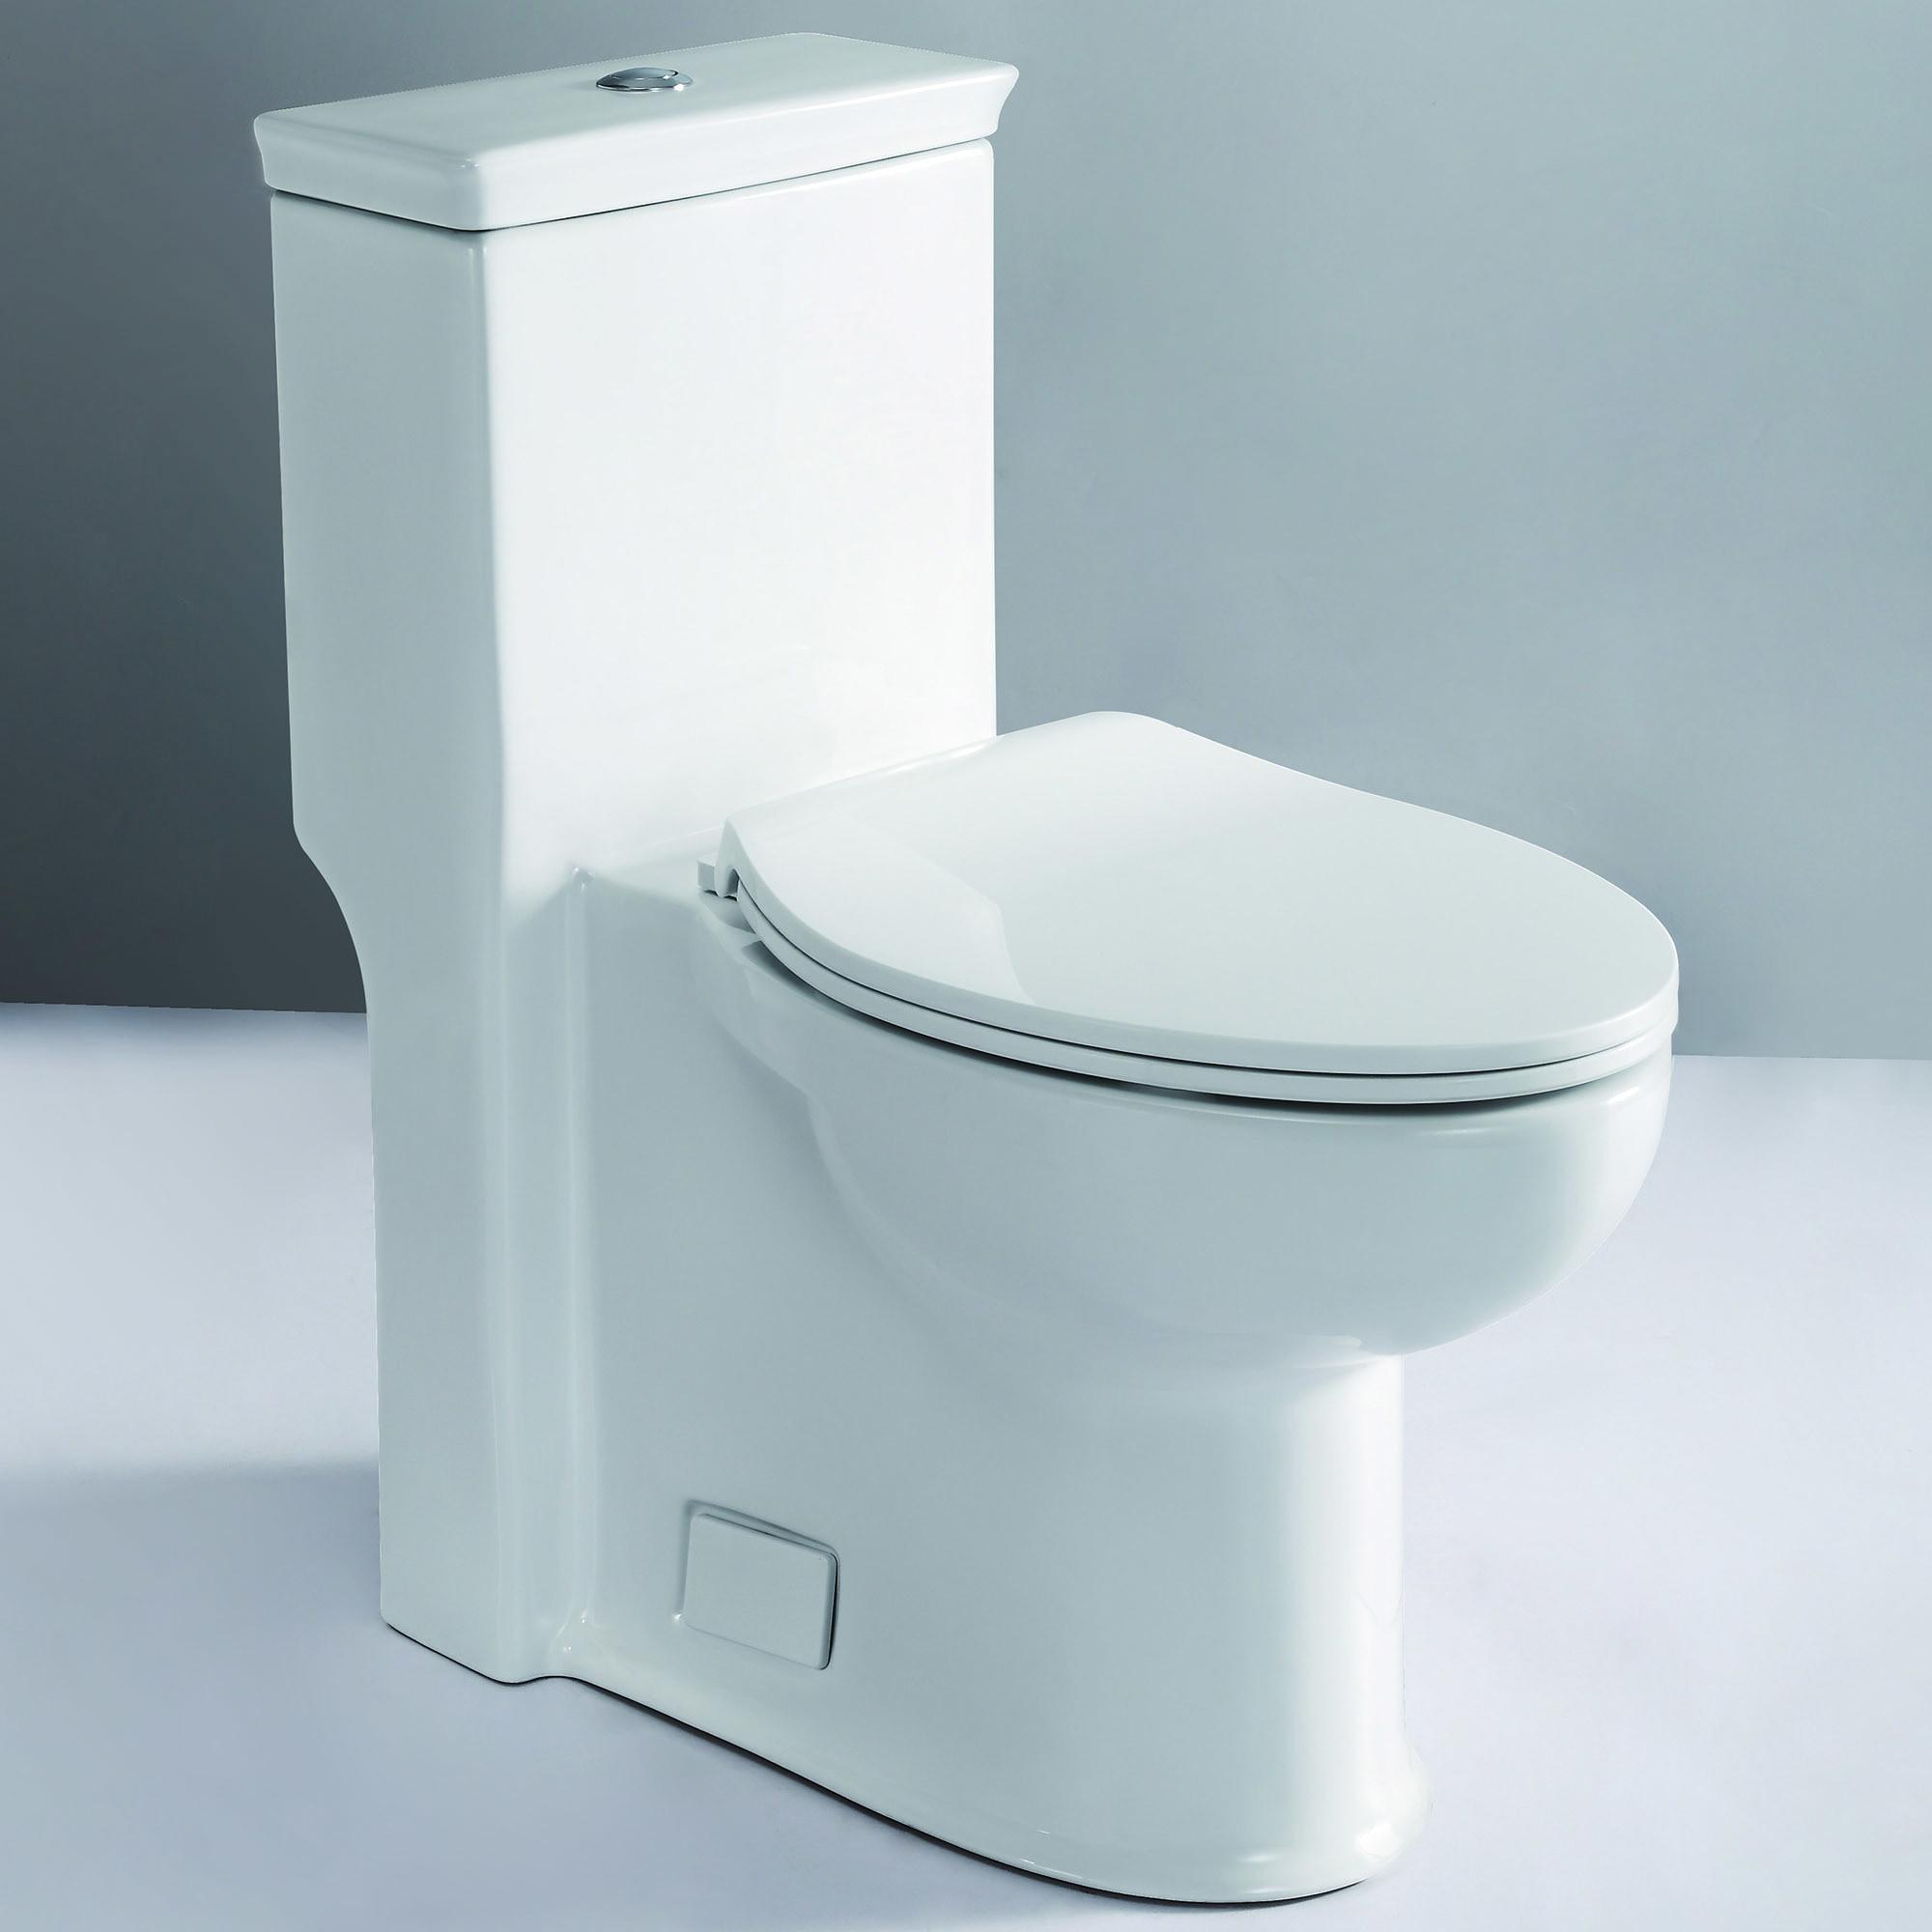 One Piece Elongated Toilet / White / Elongated / 1.28 GPF / 28 1/2 x 14 1/2 x 30 1/2 / TB377 TB377 ADA Compliant High Efficiency One Piece Single Flush Toilet 0